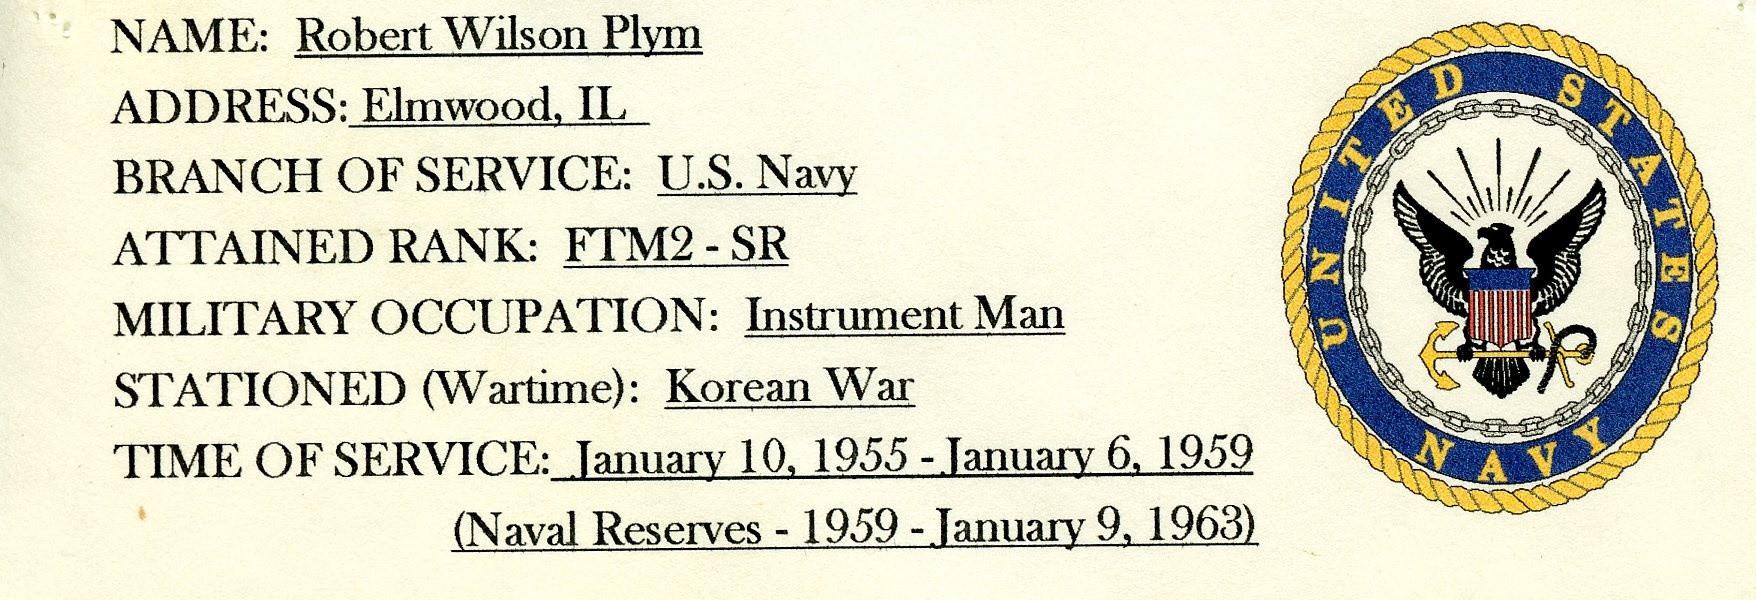 Plym, Robert Wilson.jpg